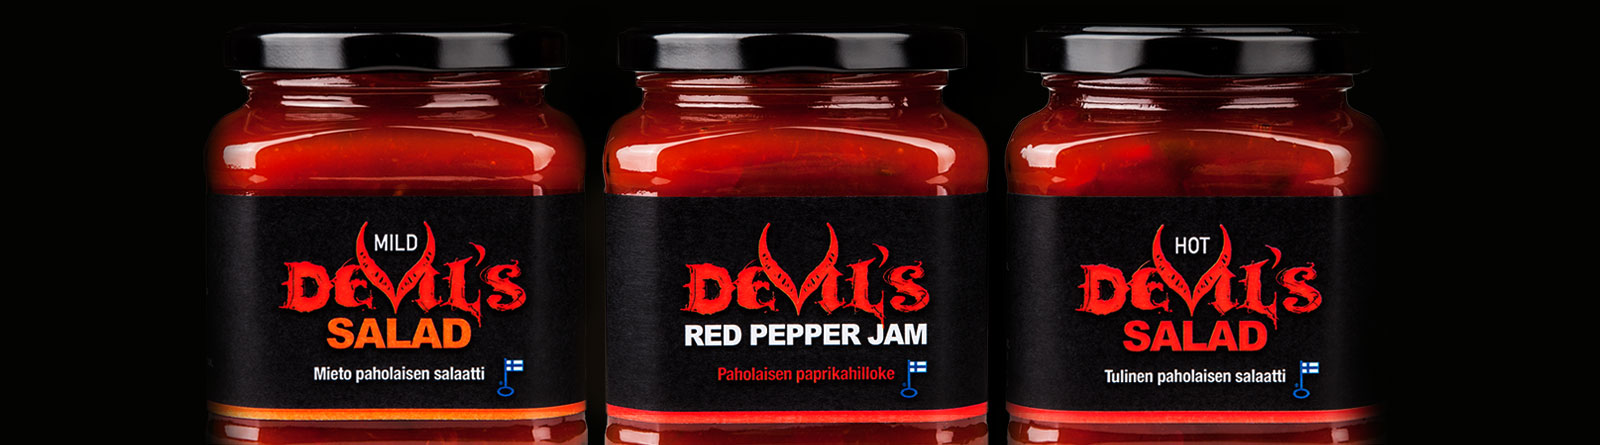 Herkkumaan Devil's Salad ja Devil's Red Pepper Jam -tuoteperheen ilmeen suunnittelu